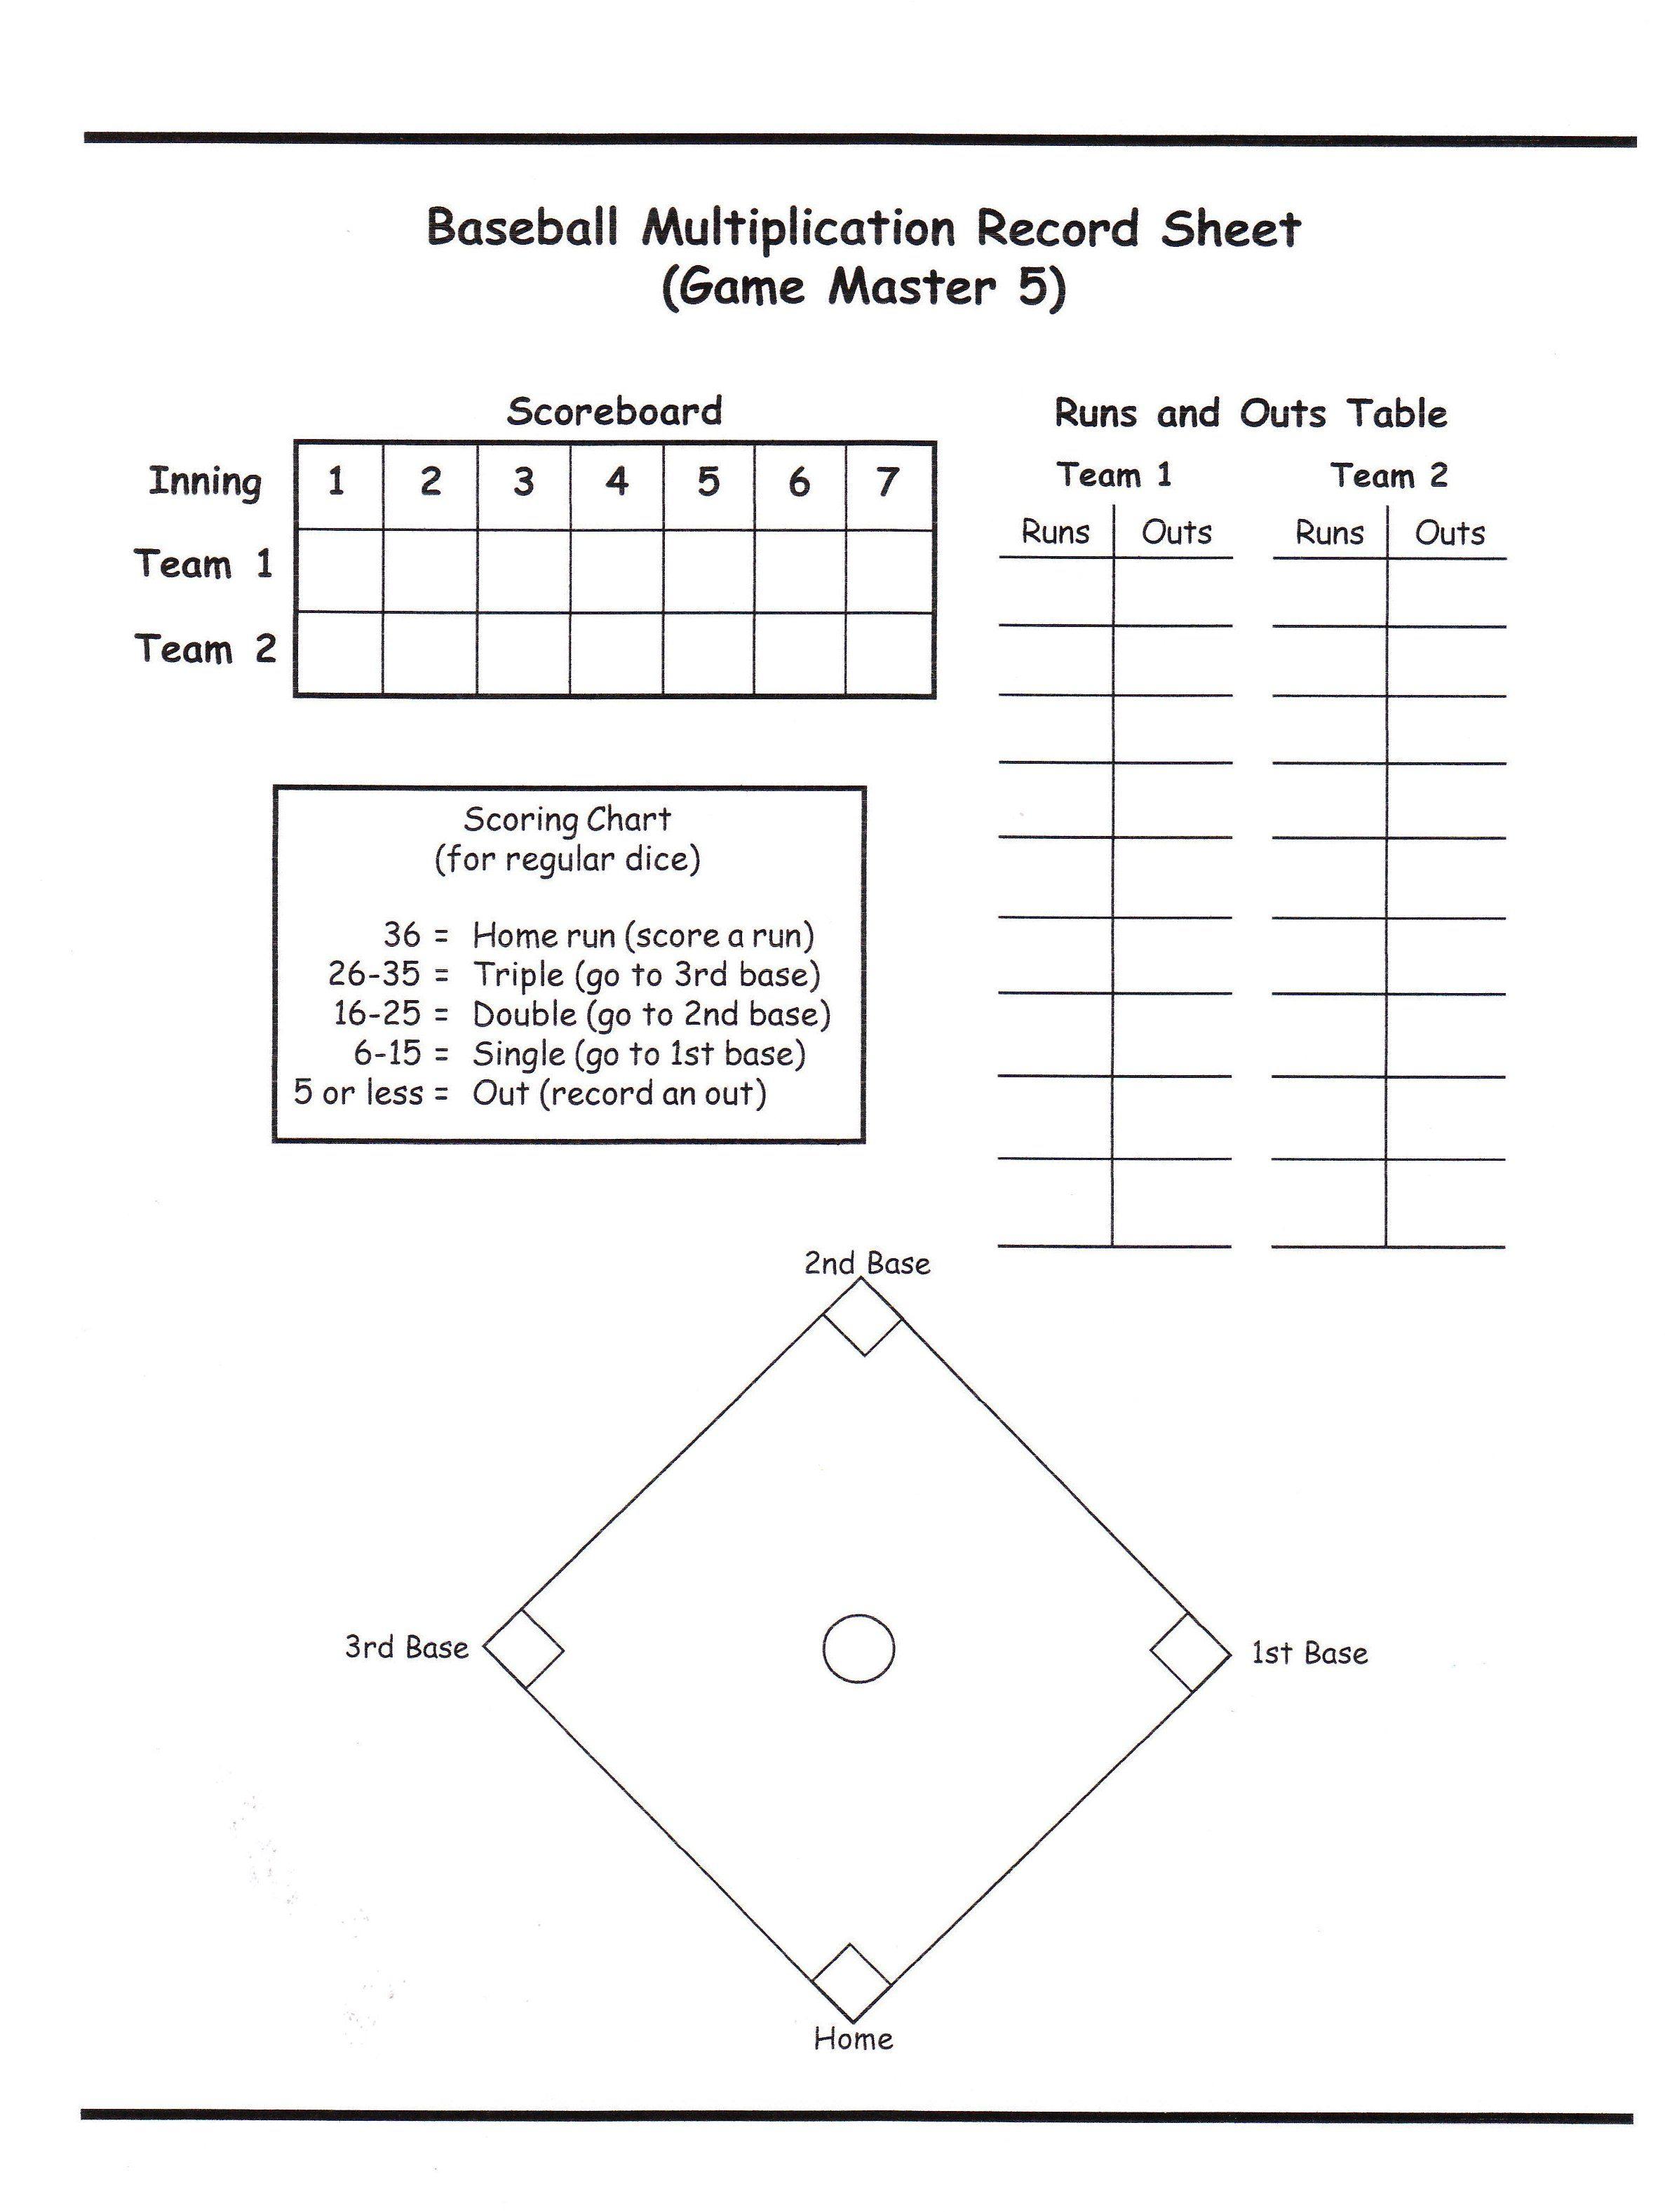 Baseball Dice Game Score Sheet Google Search Math Worksheets Free Printable Math Worksheets Printable Math Worksheets